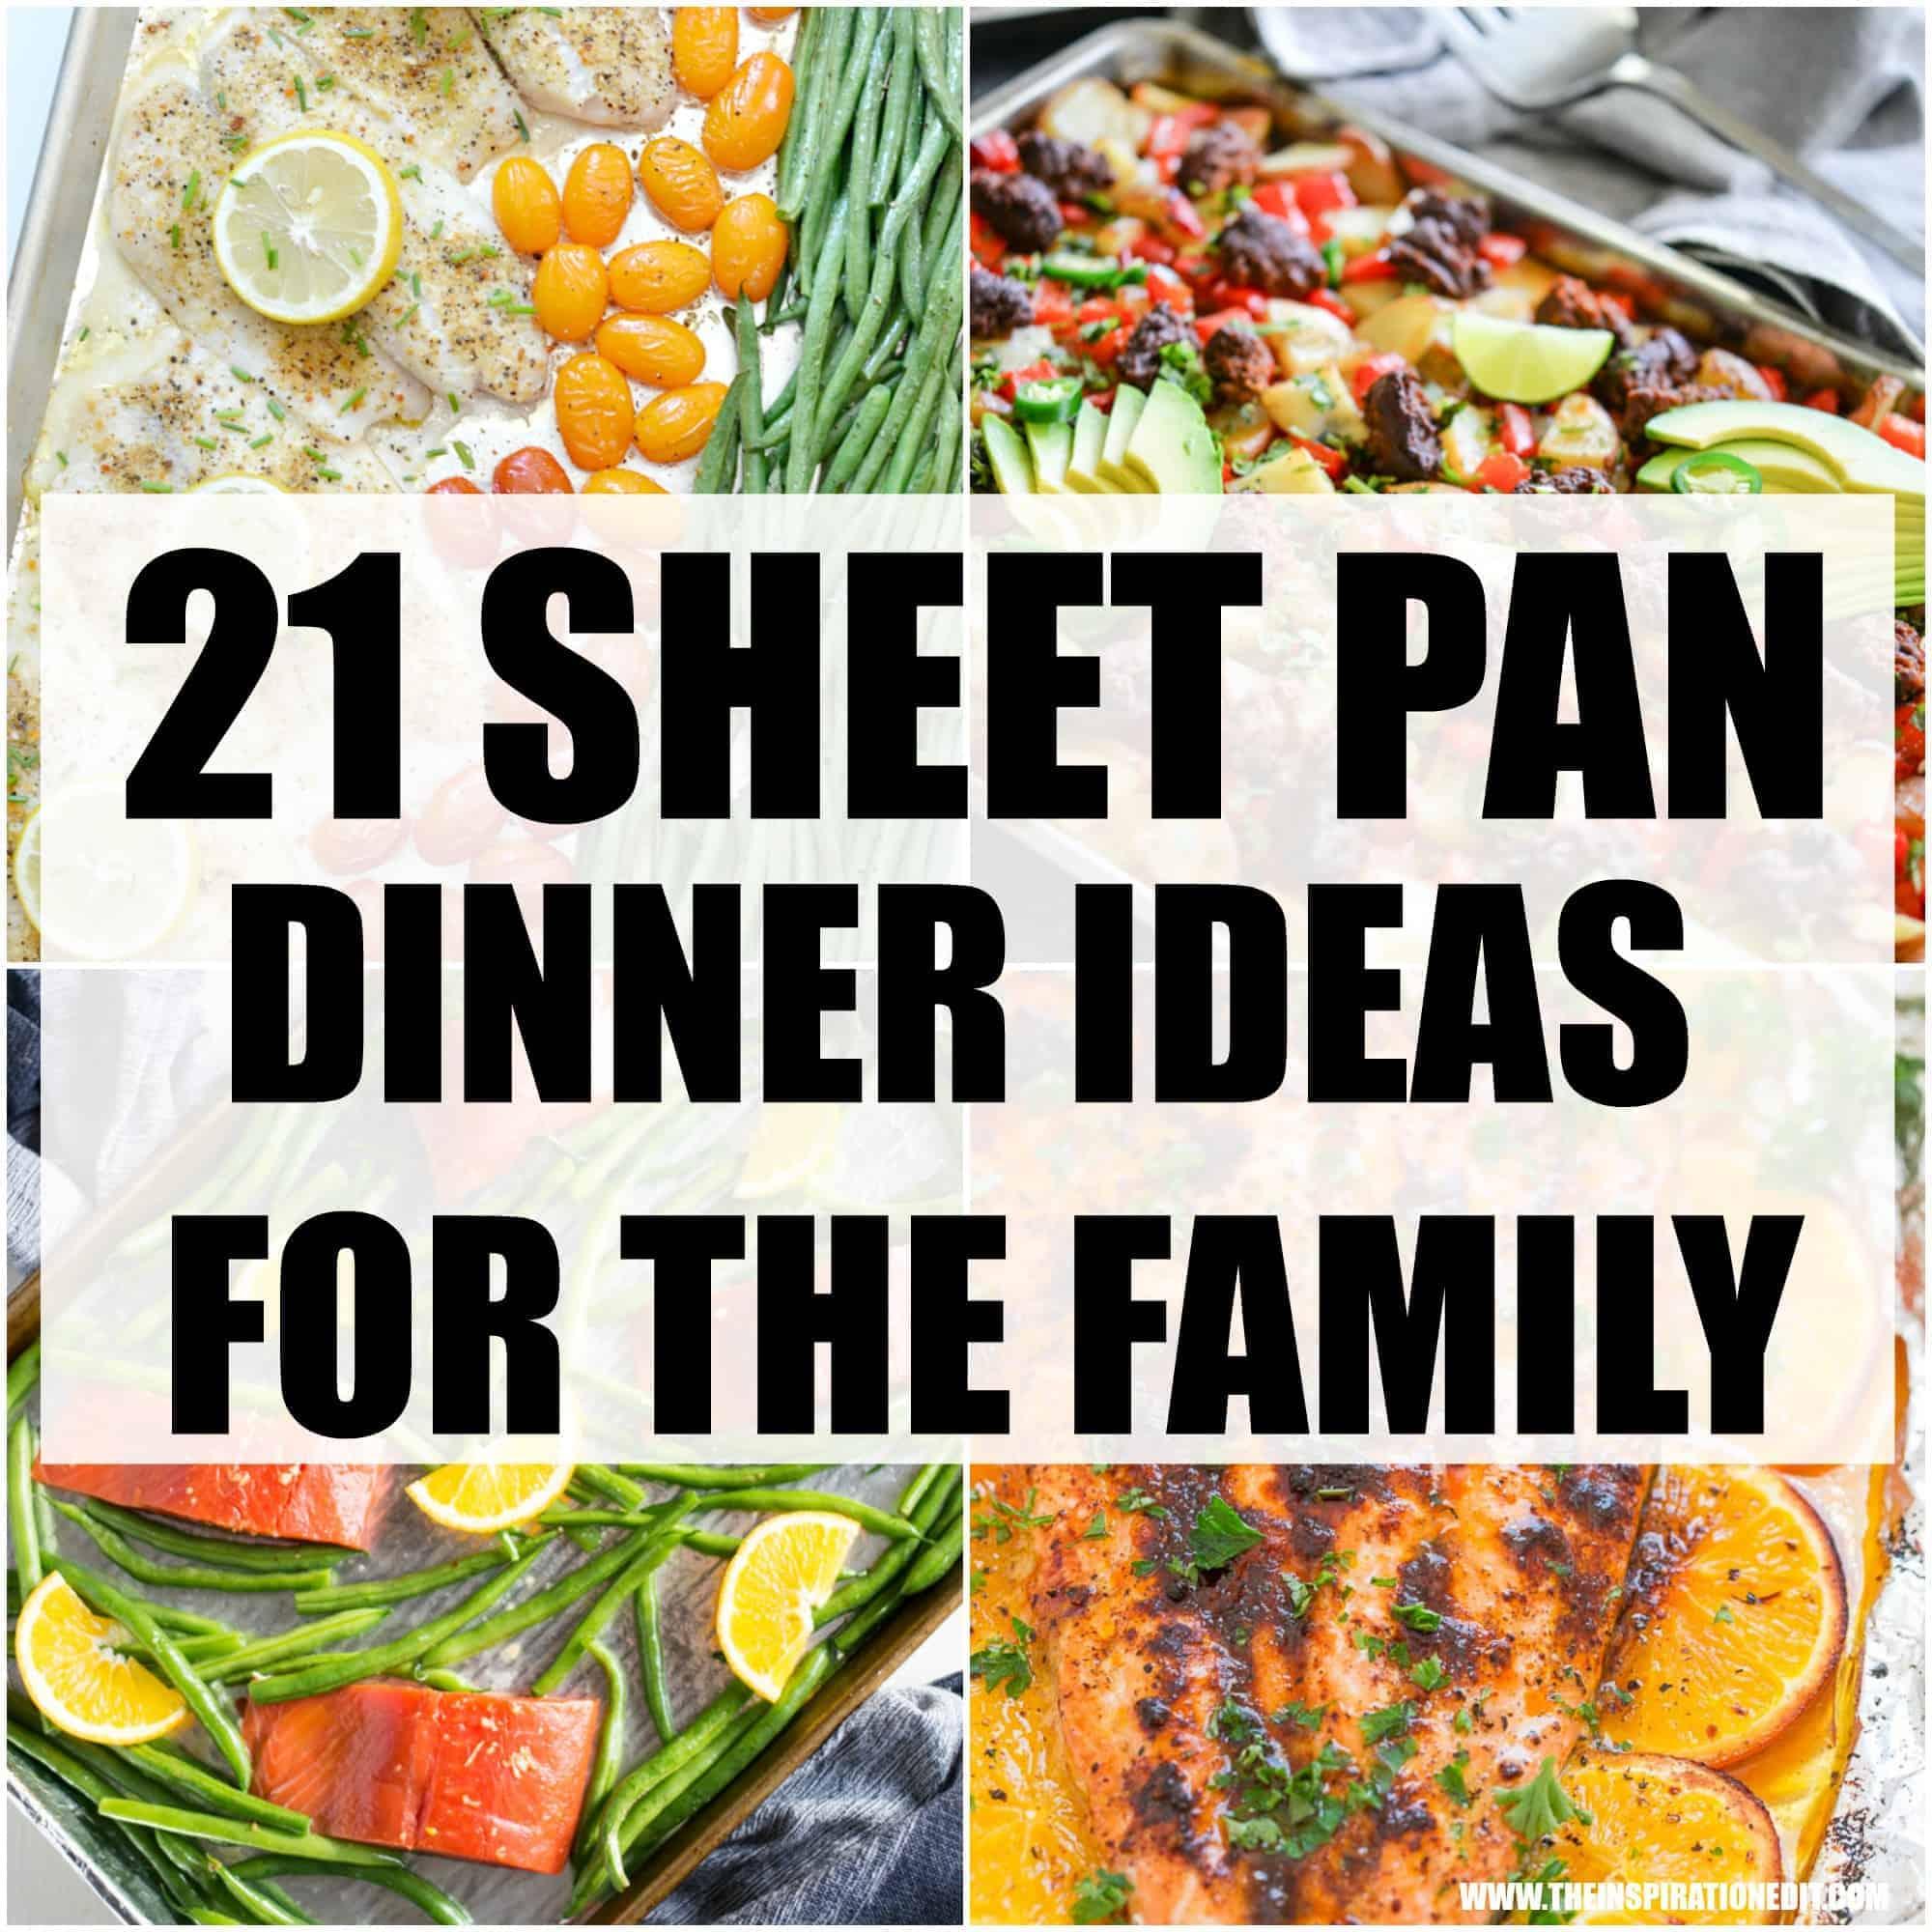 SHEET PAN DINNER RECIPES FOR THE FAMILY